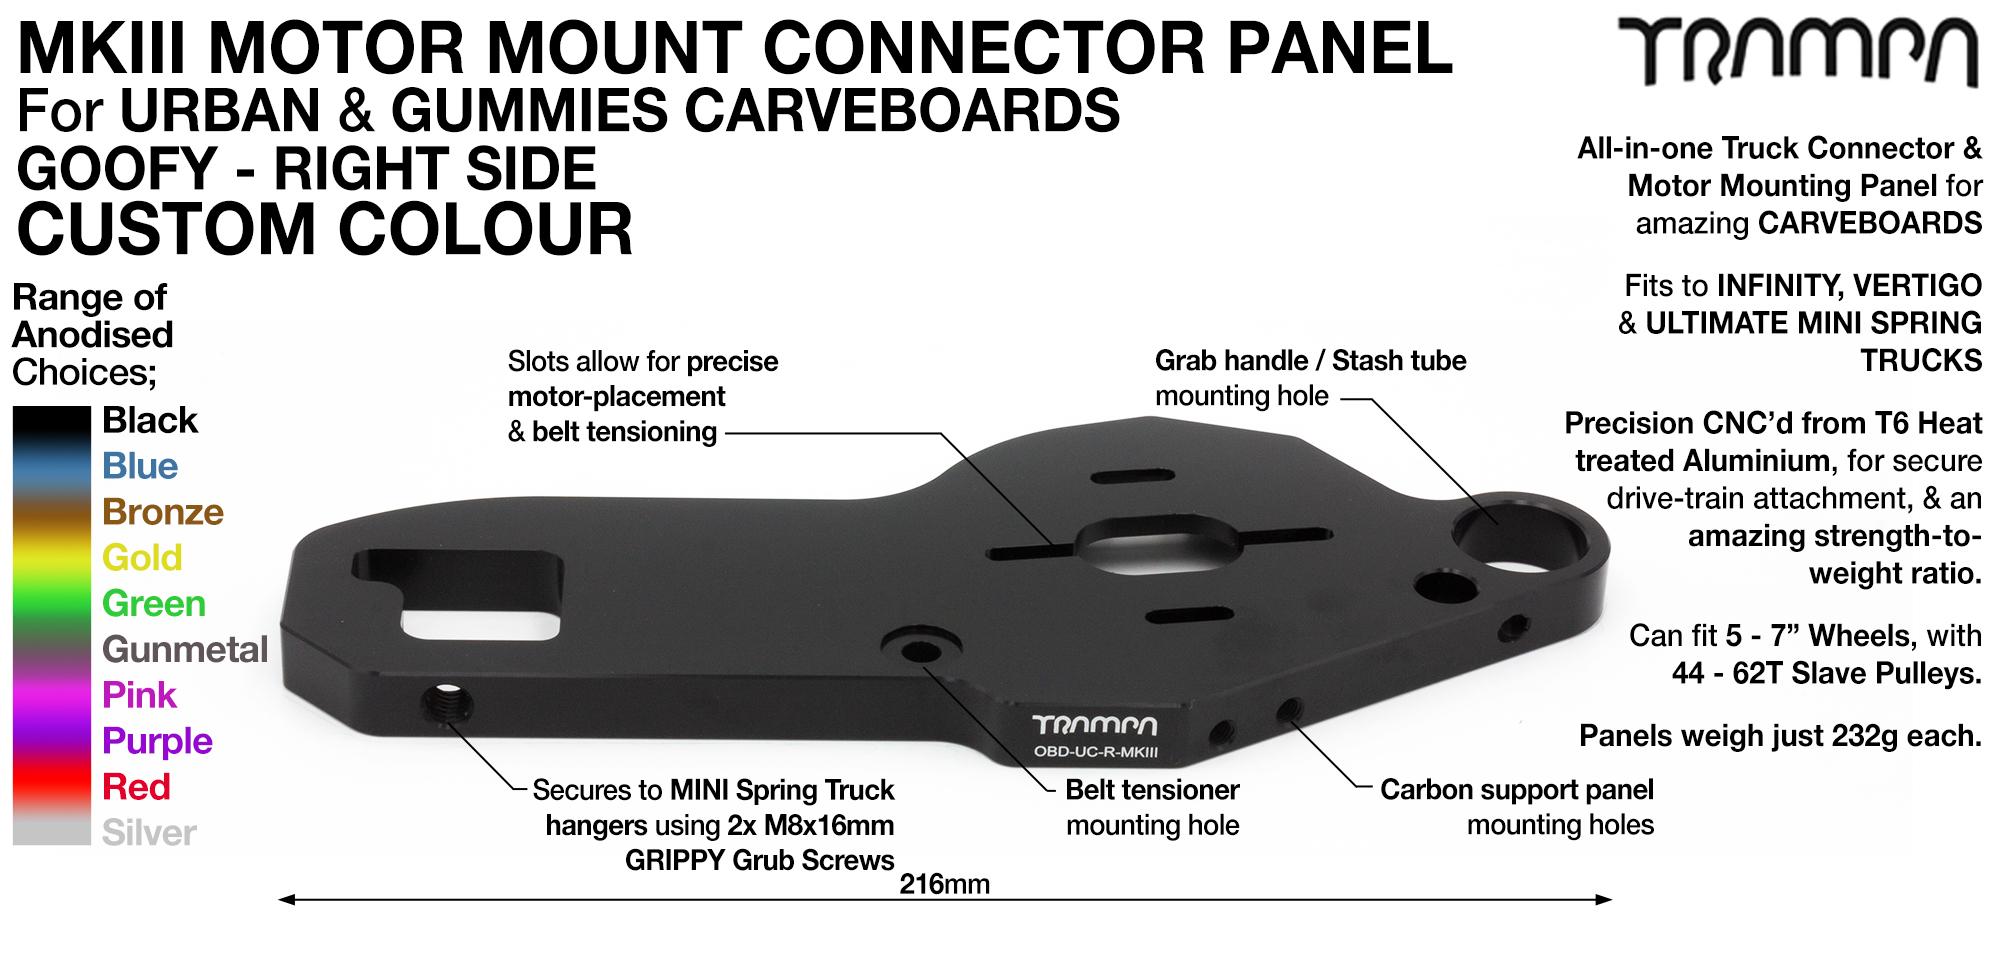 MkIII CARVE Truck Motor Mount T6 Aluminium Anodised - GOOFY